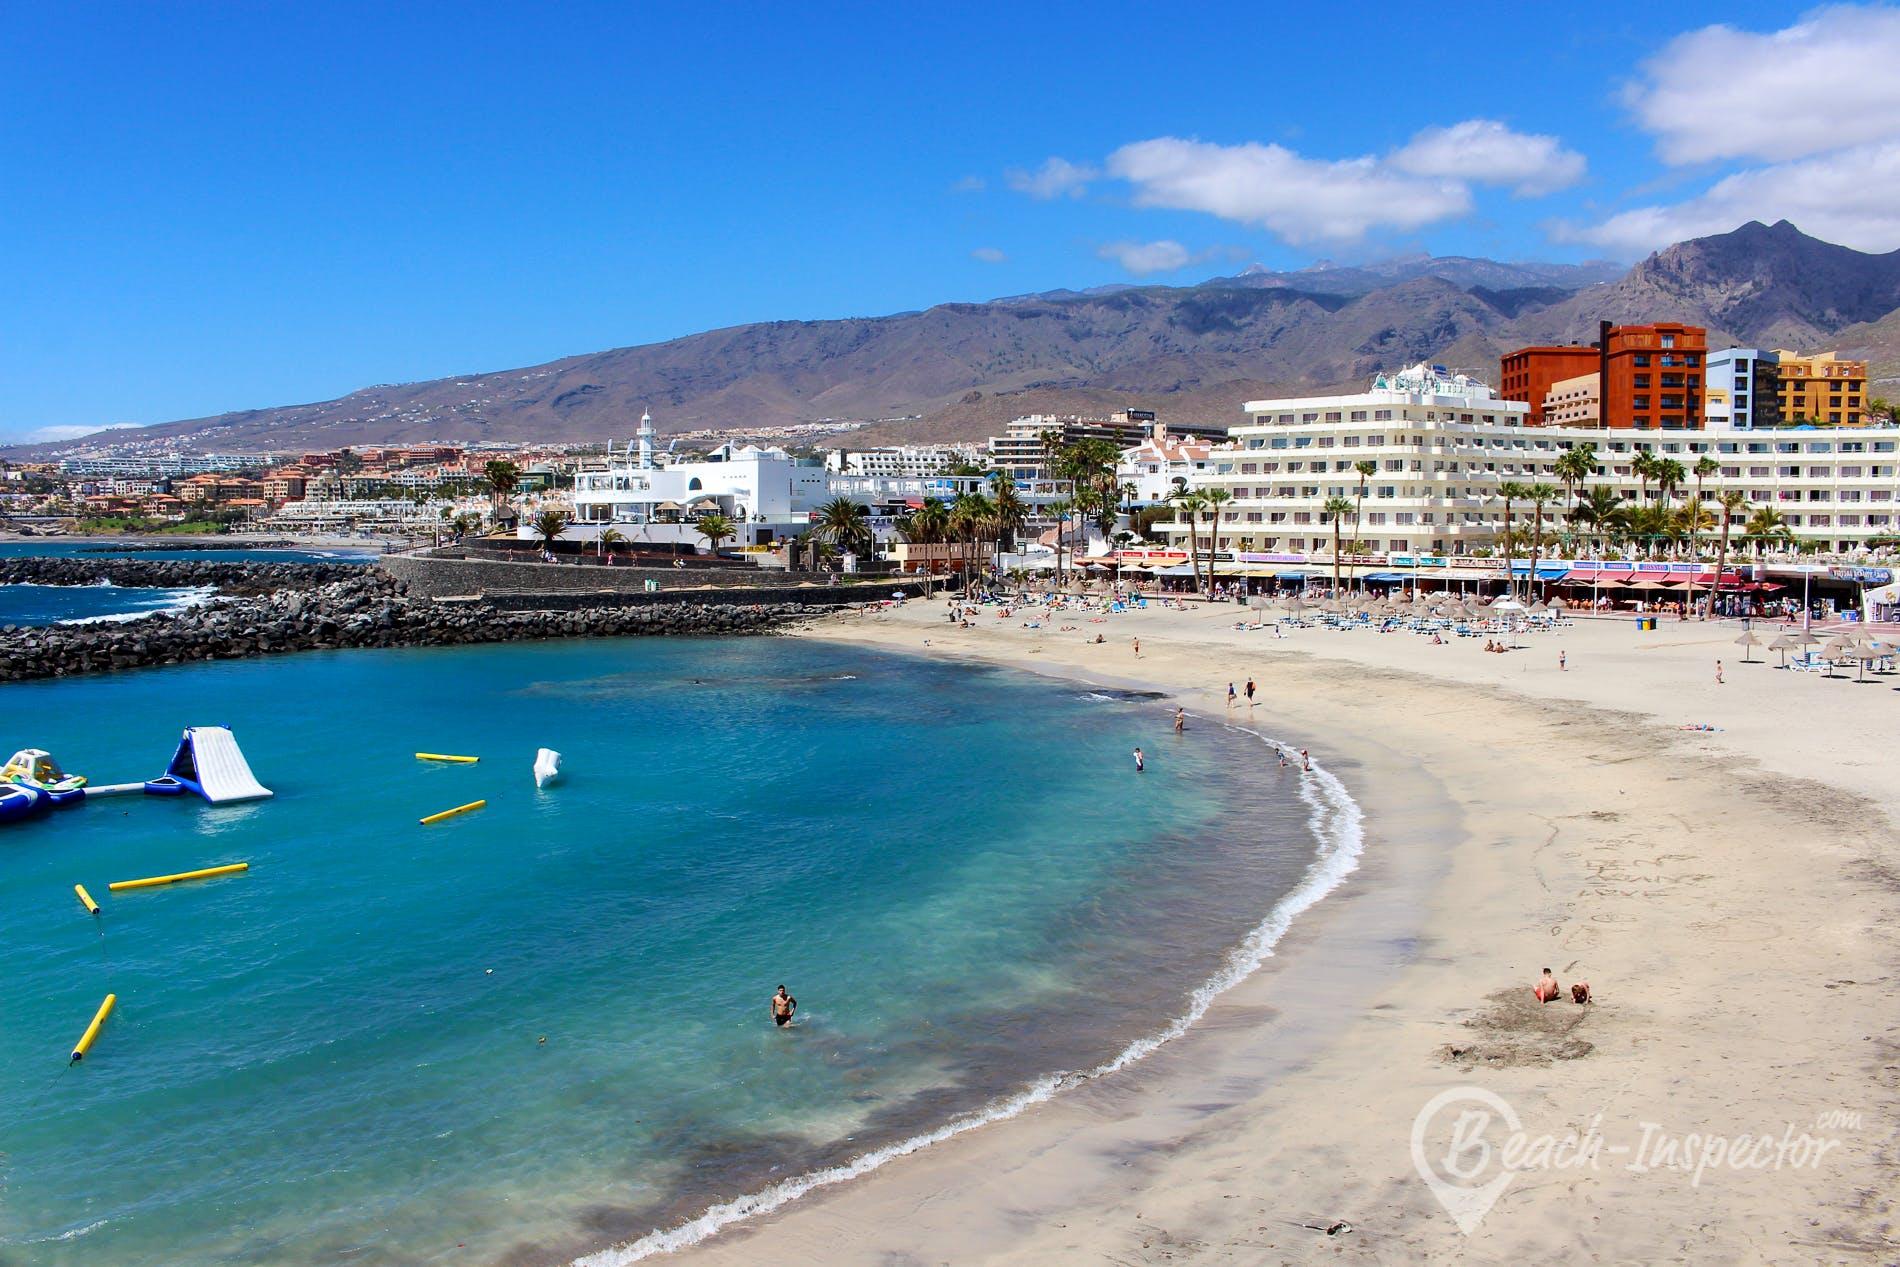 Beach Playa Puerto Colón, Tenerife, Spain